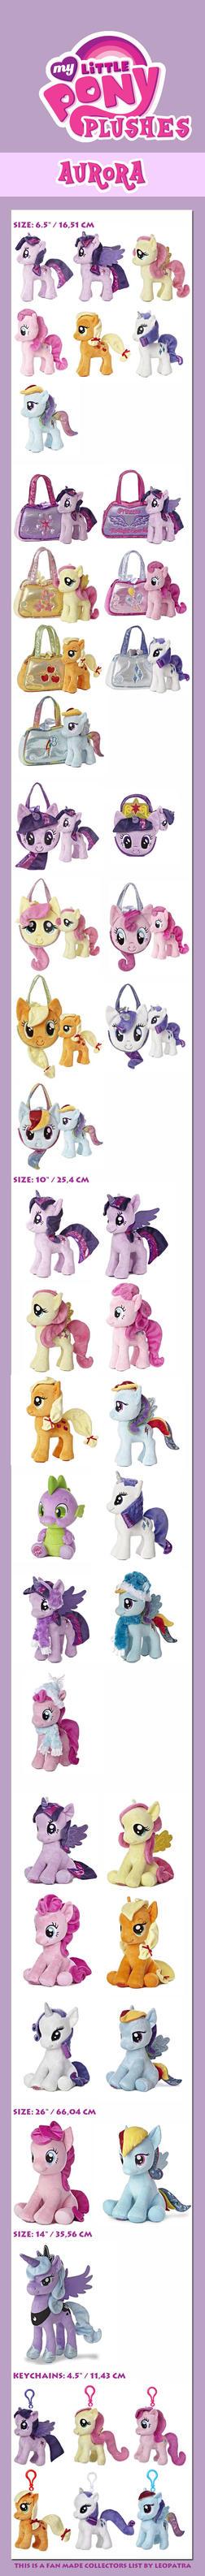 MLP FiM - My little Pony - Aurora Plush List by leopatra-lionfur